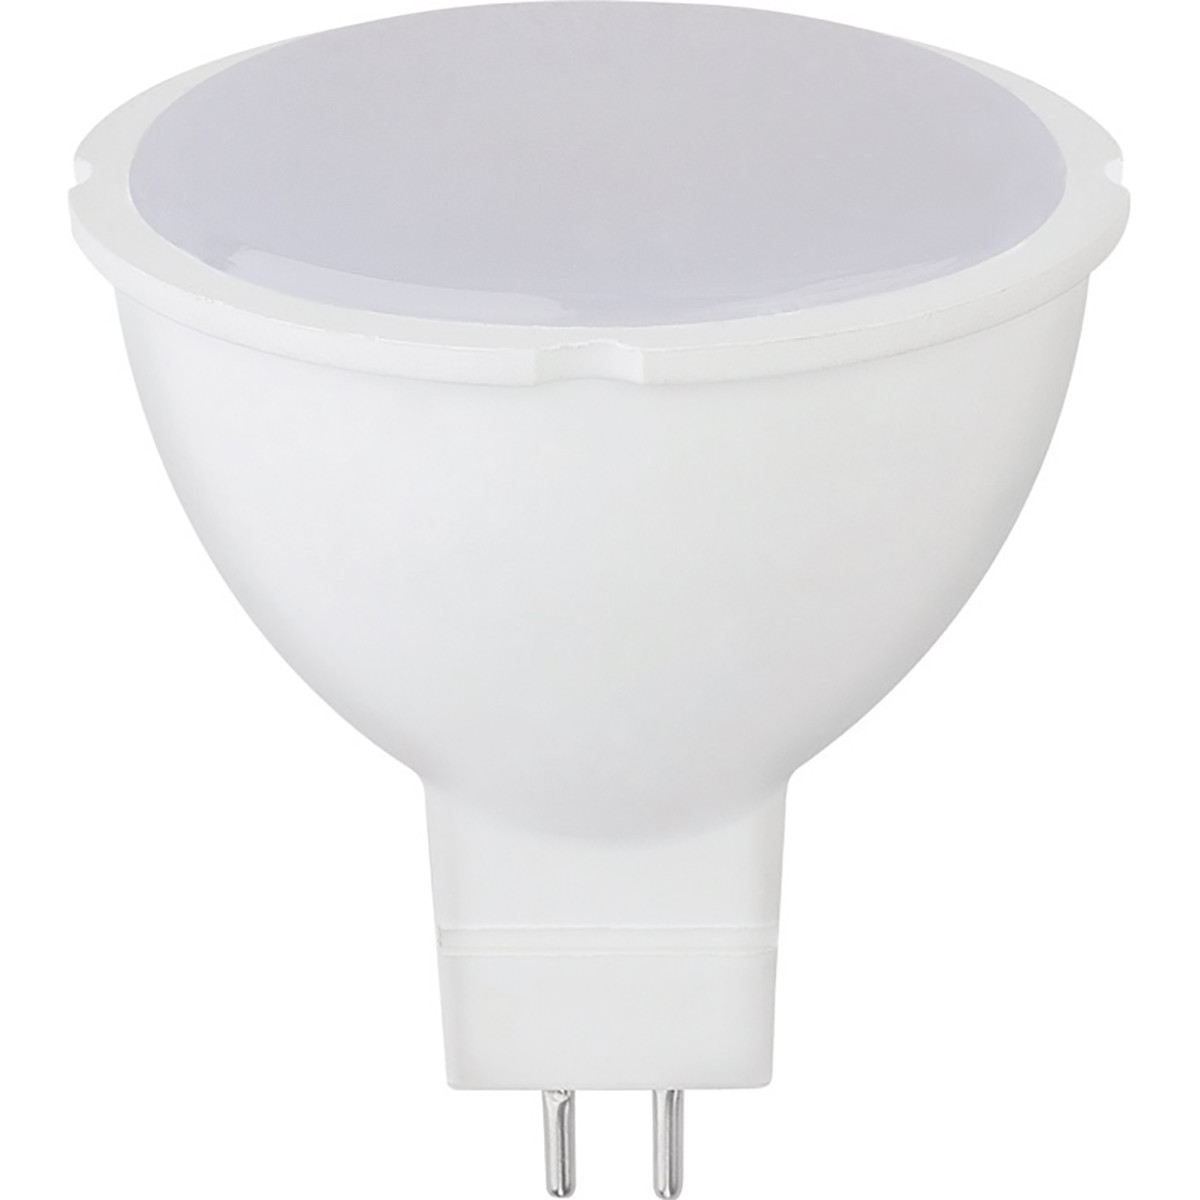 LED Spot - Fona - GU5.3 Fitting - 6W - Warm Wit 3000K - 230V